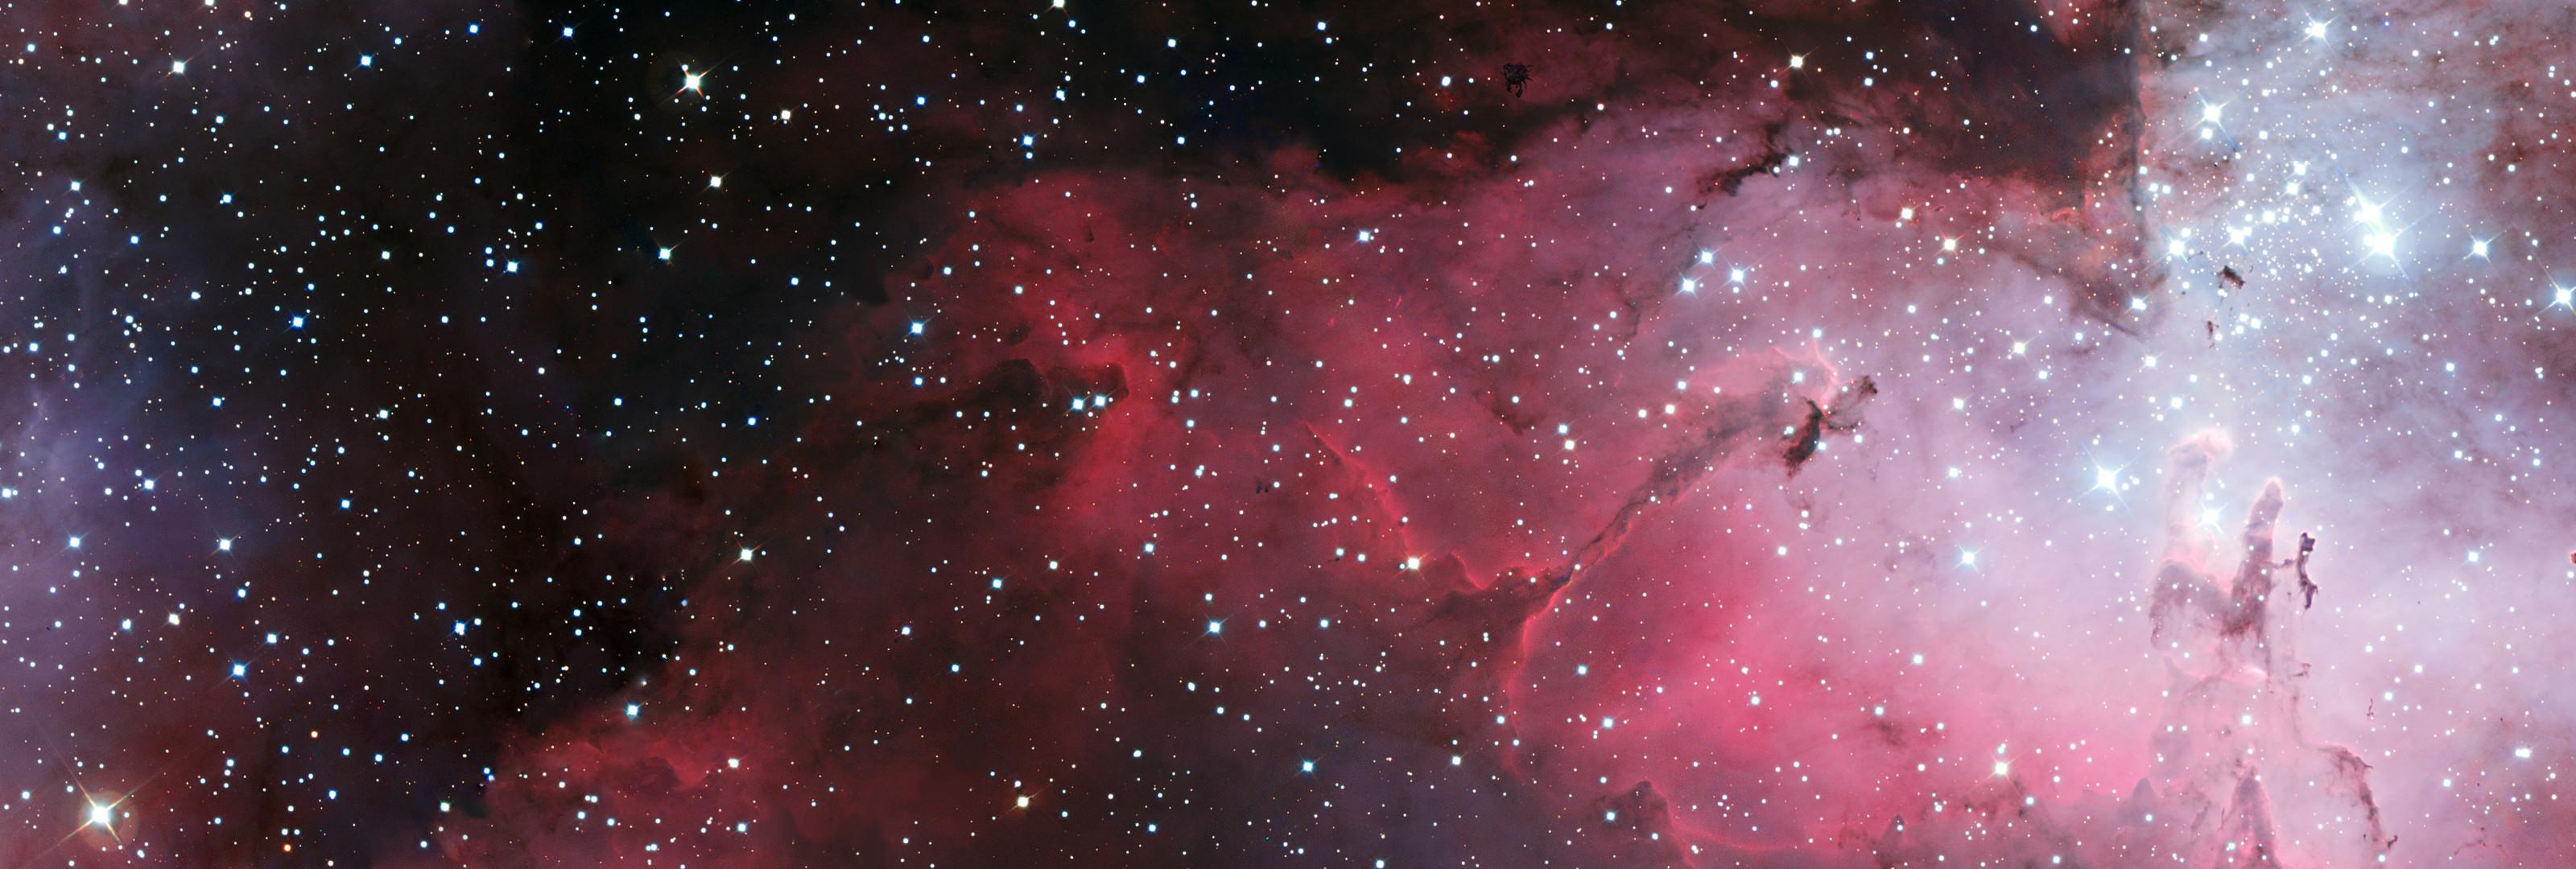 Adamantpieeater Eagle Nebula Wallpaper 3200 X 1080 By